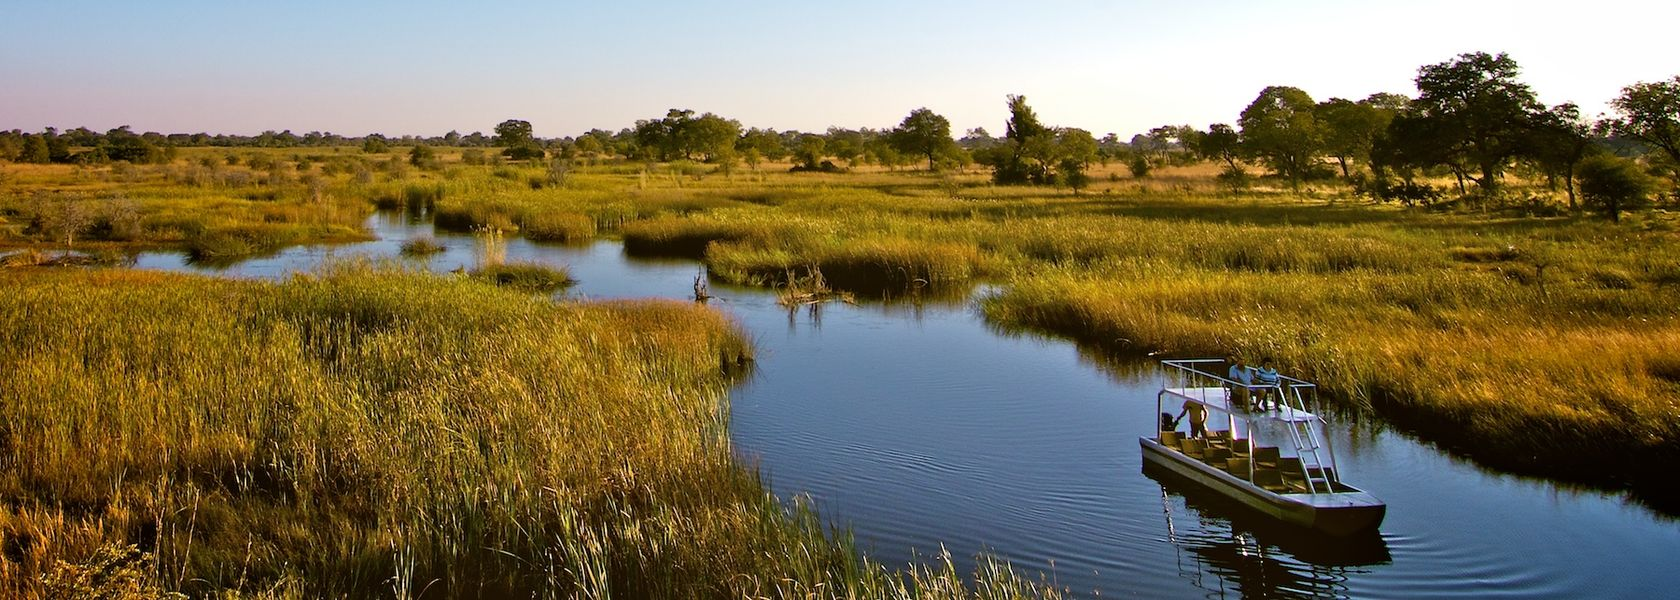 Zambezi regio in Namibië - Zambezi River - Caprivistrook